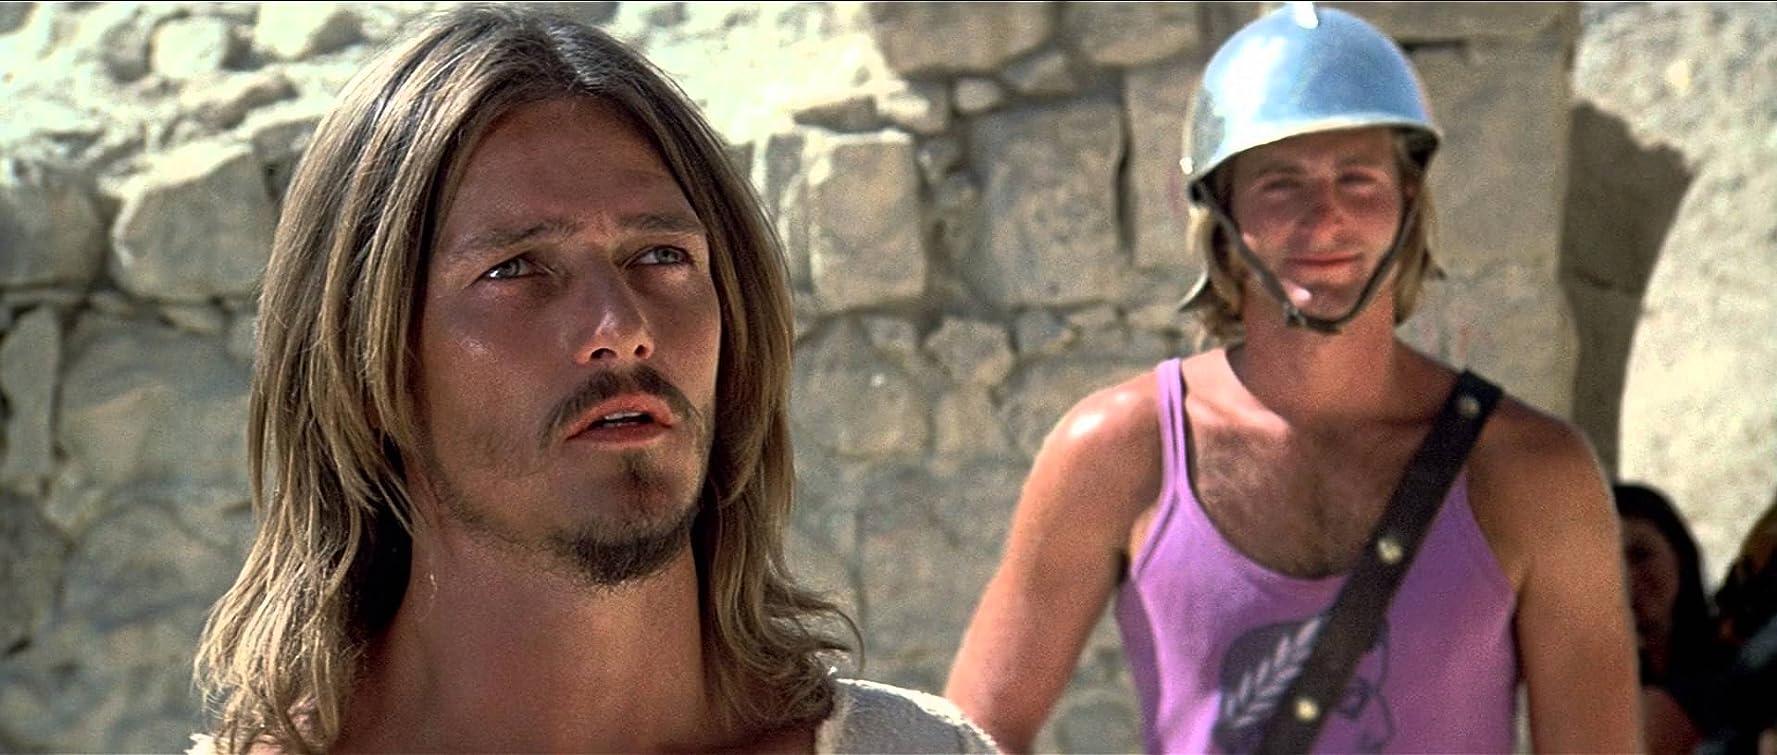 Expectativa jesus cristo super star